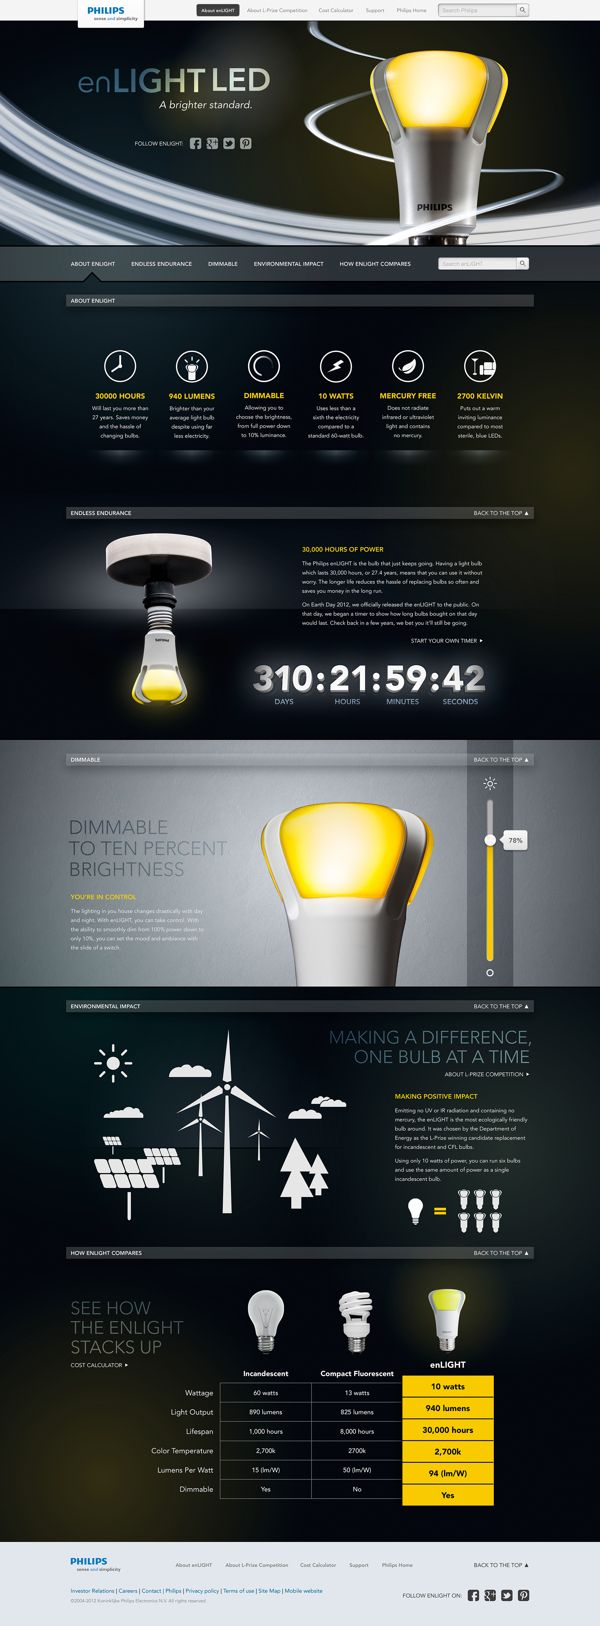 Philips LED Branding #webdesign #it #web #design #layout #userinterface #website #webdesign